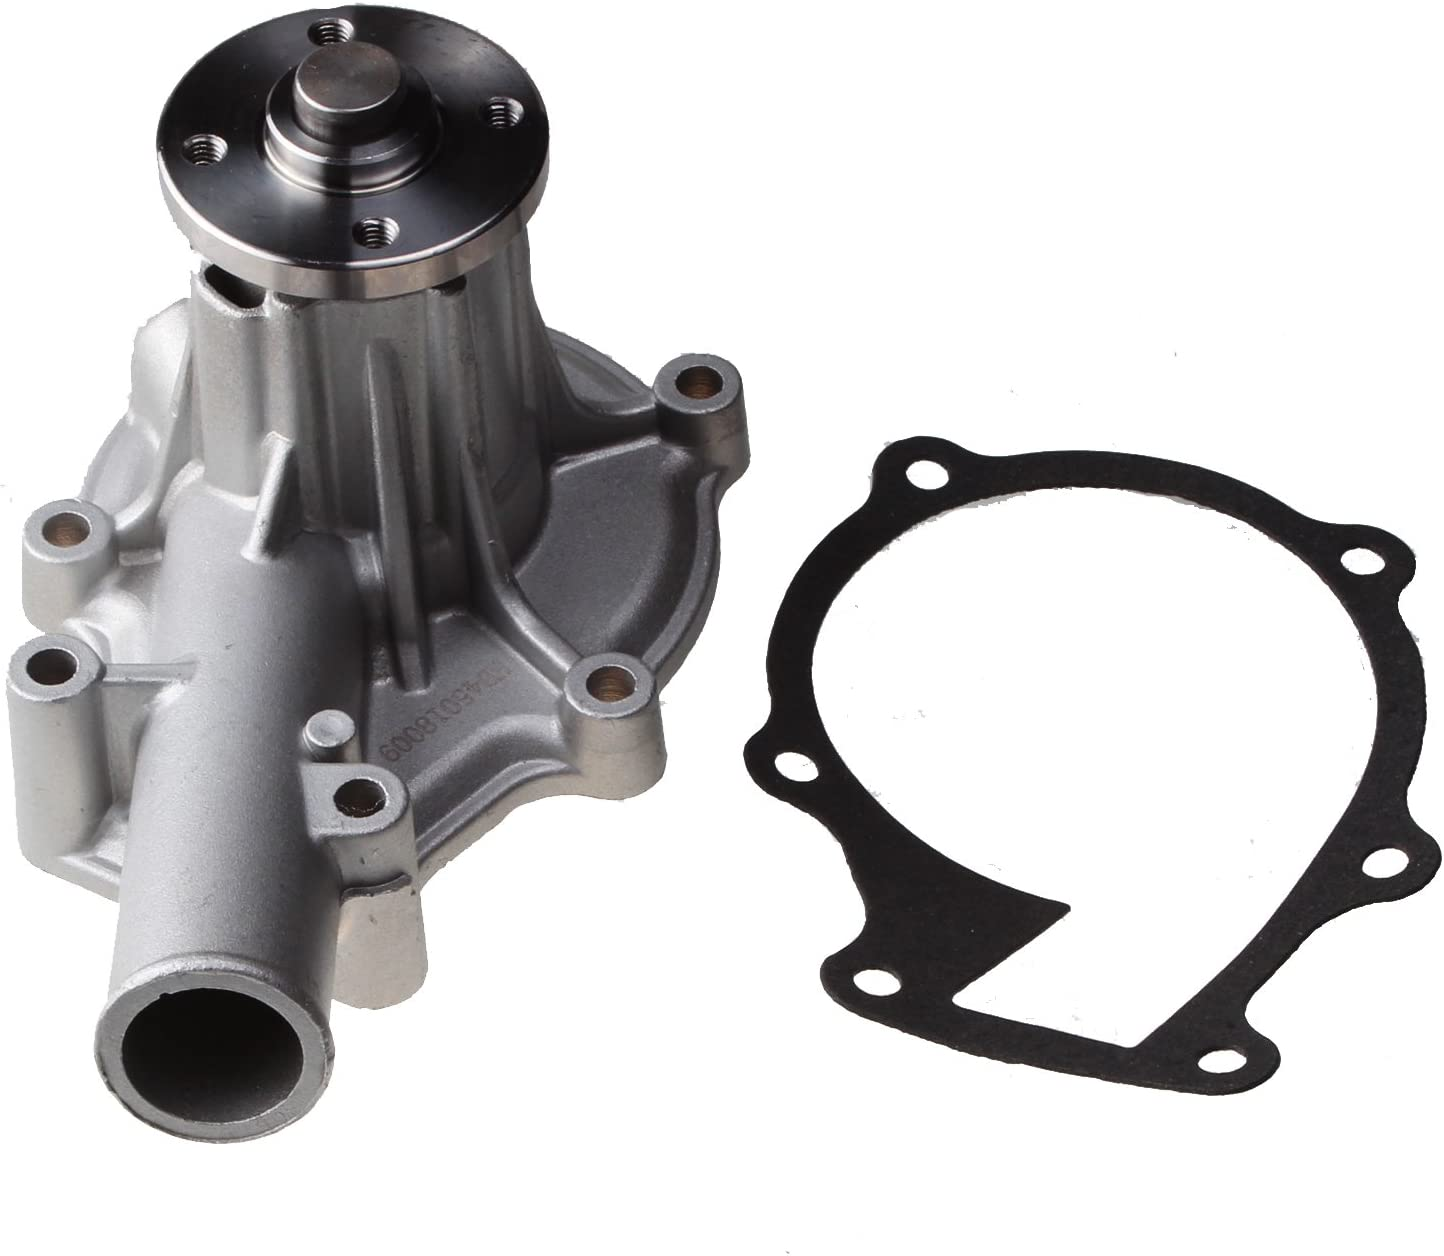 For Jacobsen LF 4675 4677 LF550 570 LF3400 3800 Mower Water Pump 4165525